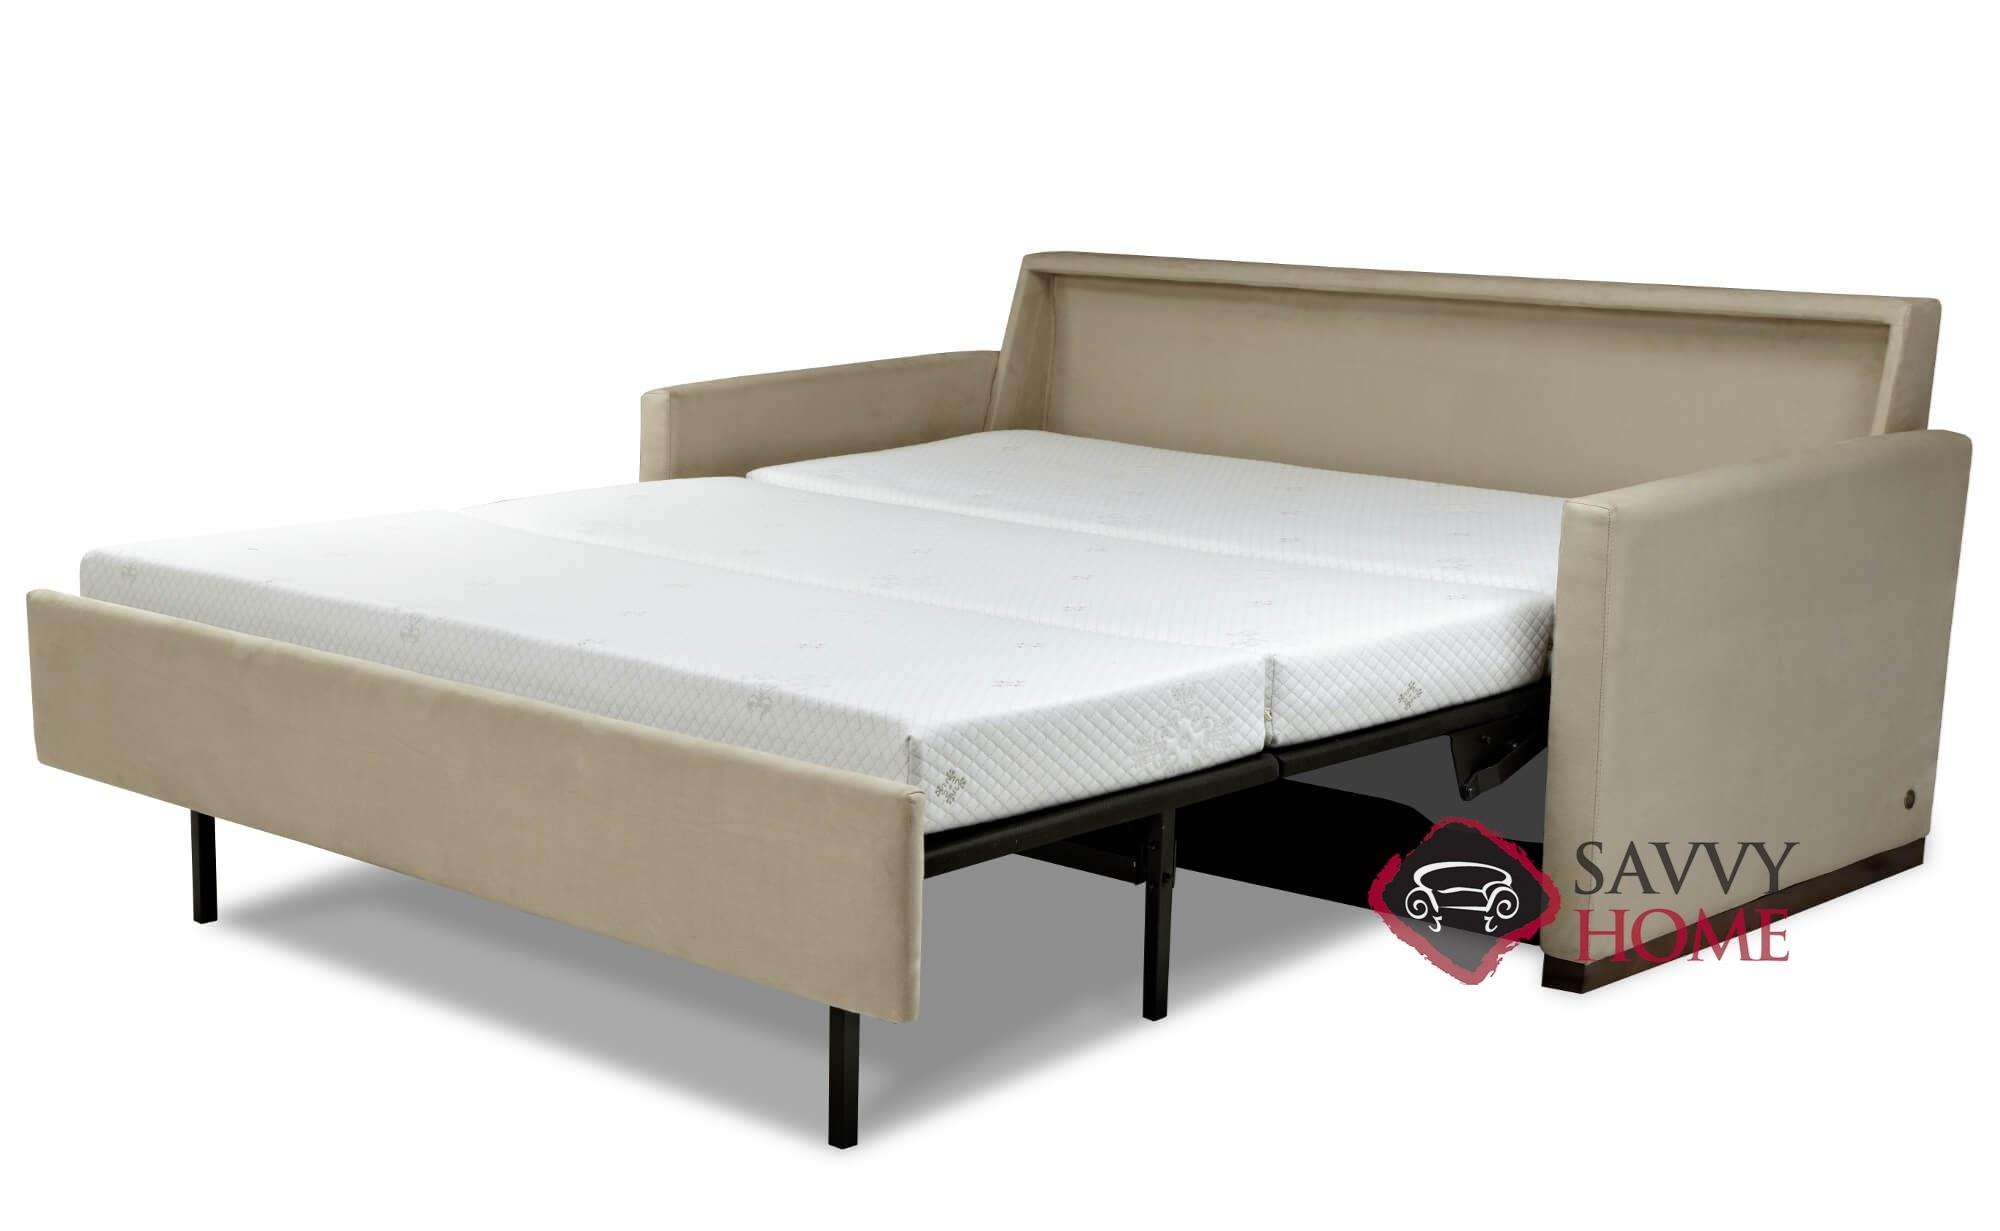 sleeper w mak comfort trim b arm plus by ks products comforter sofa item leather makayla queen roll american nailhead